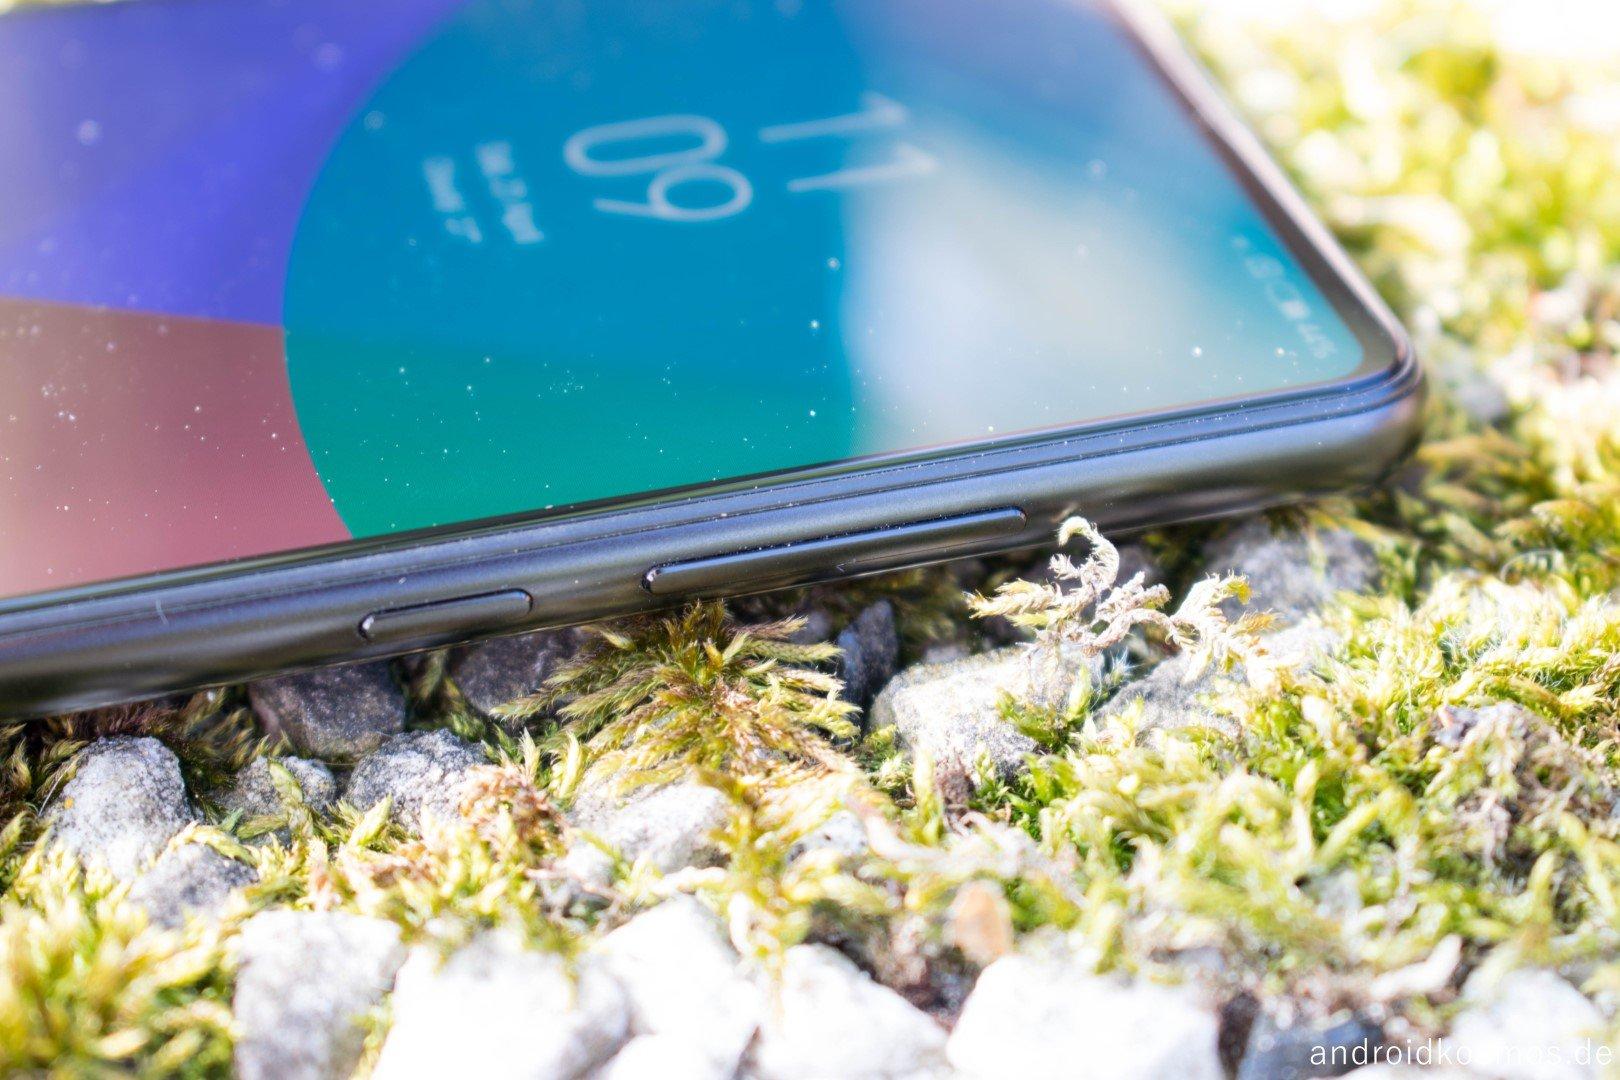 Androidkosmos.de Xiaomi Mi Mix 2s  59 von 71